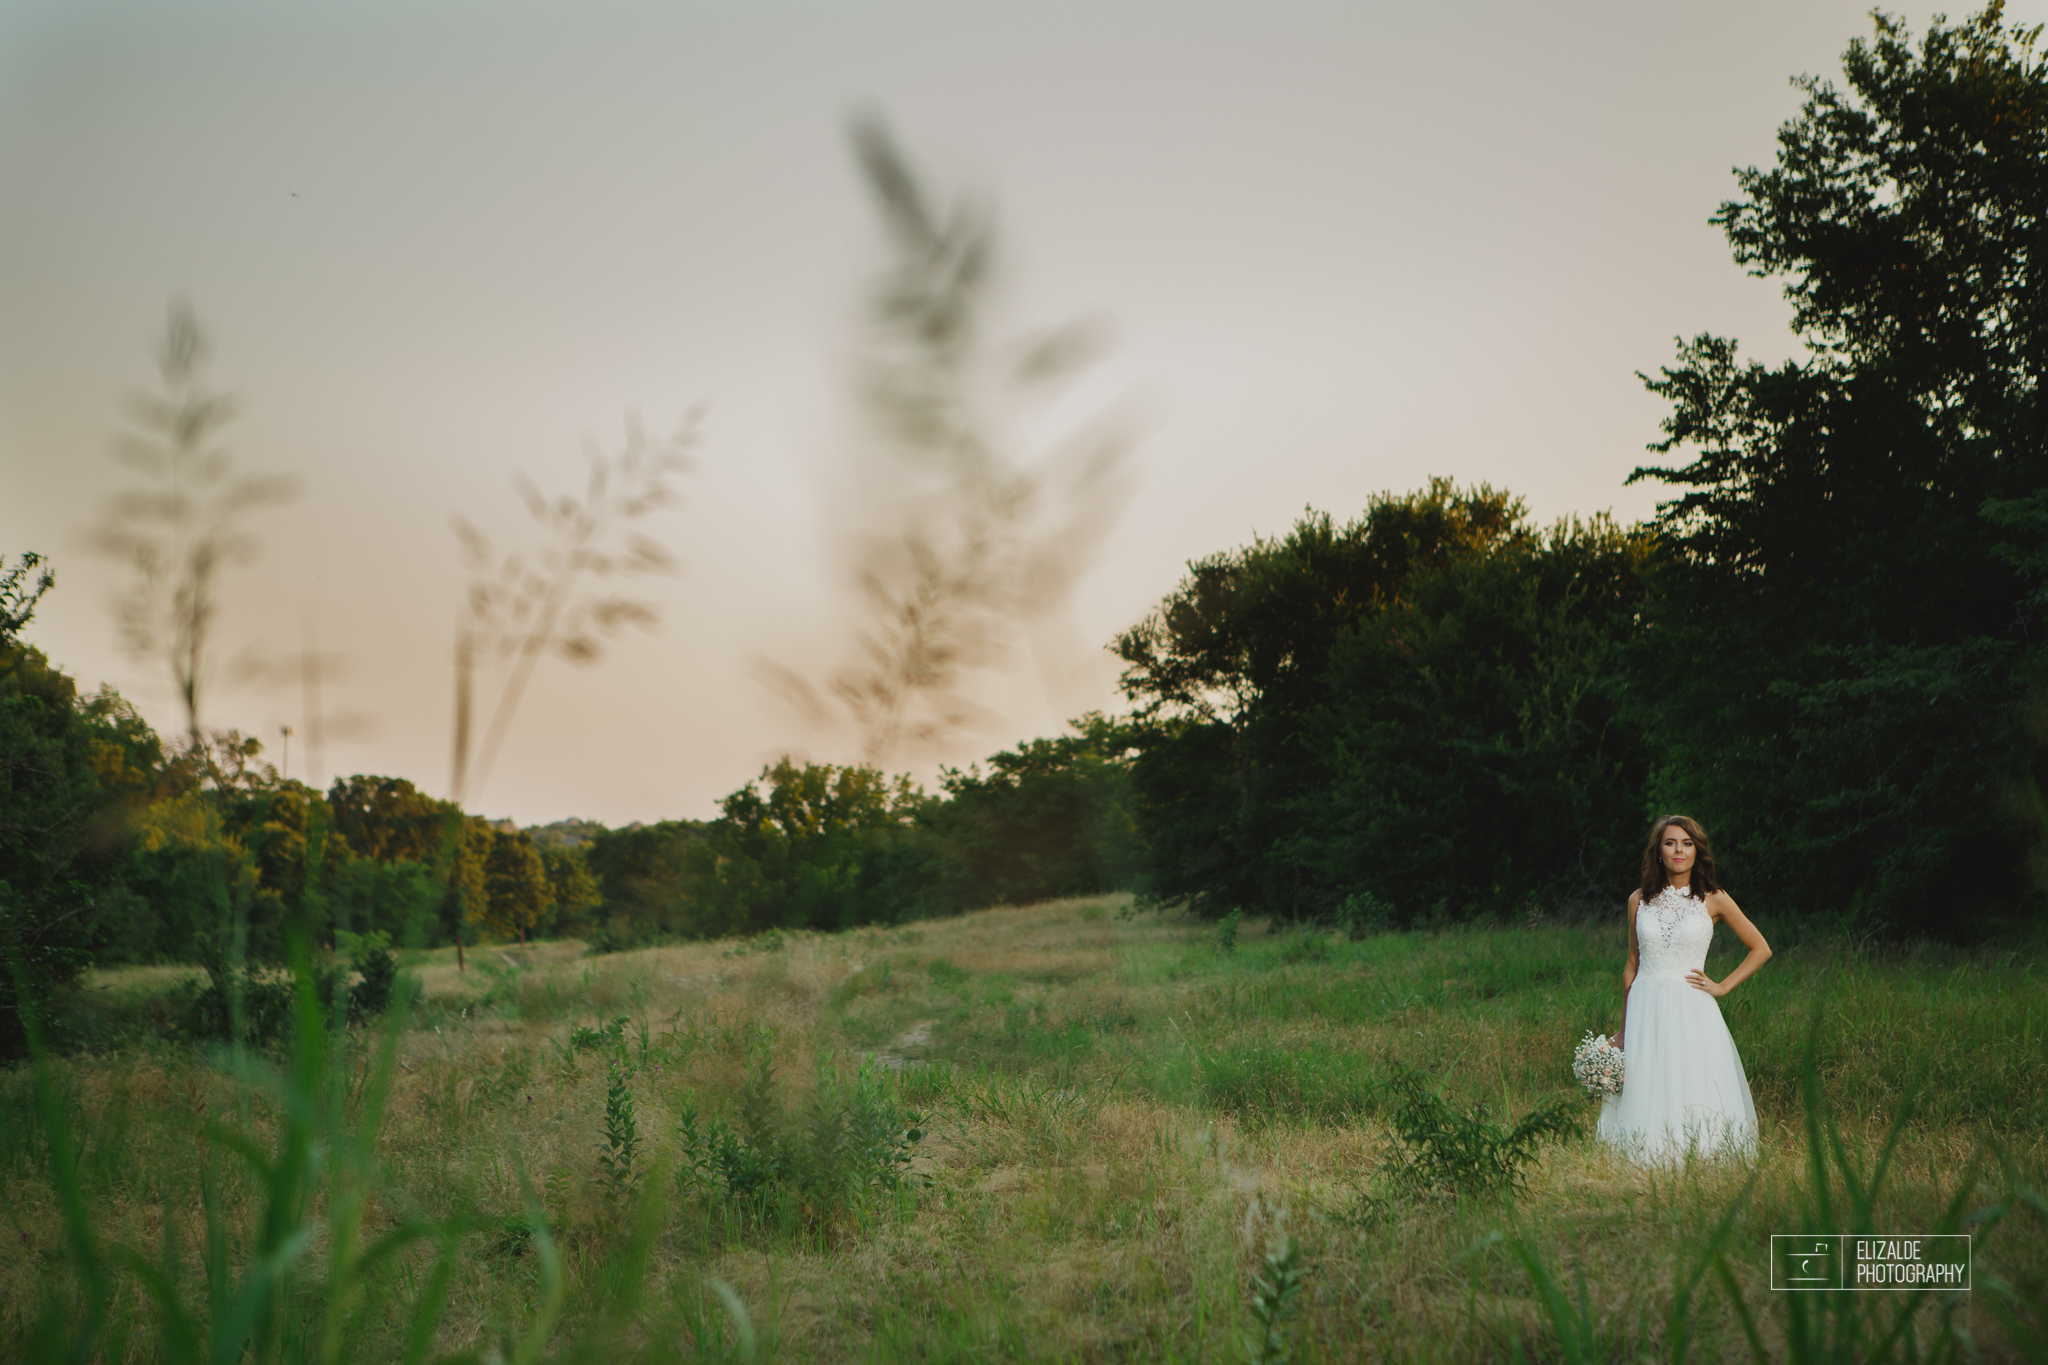 Bridal session_Dallas Photographer_Elizalde Photography_Denton photographer_ DFW Photographer_ Wedding Photographer_Baleigh19.jpg